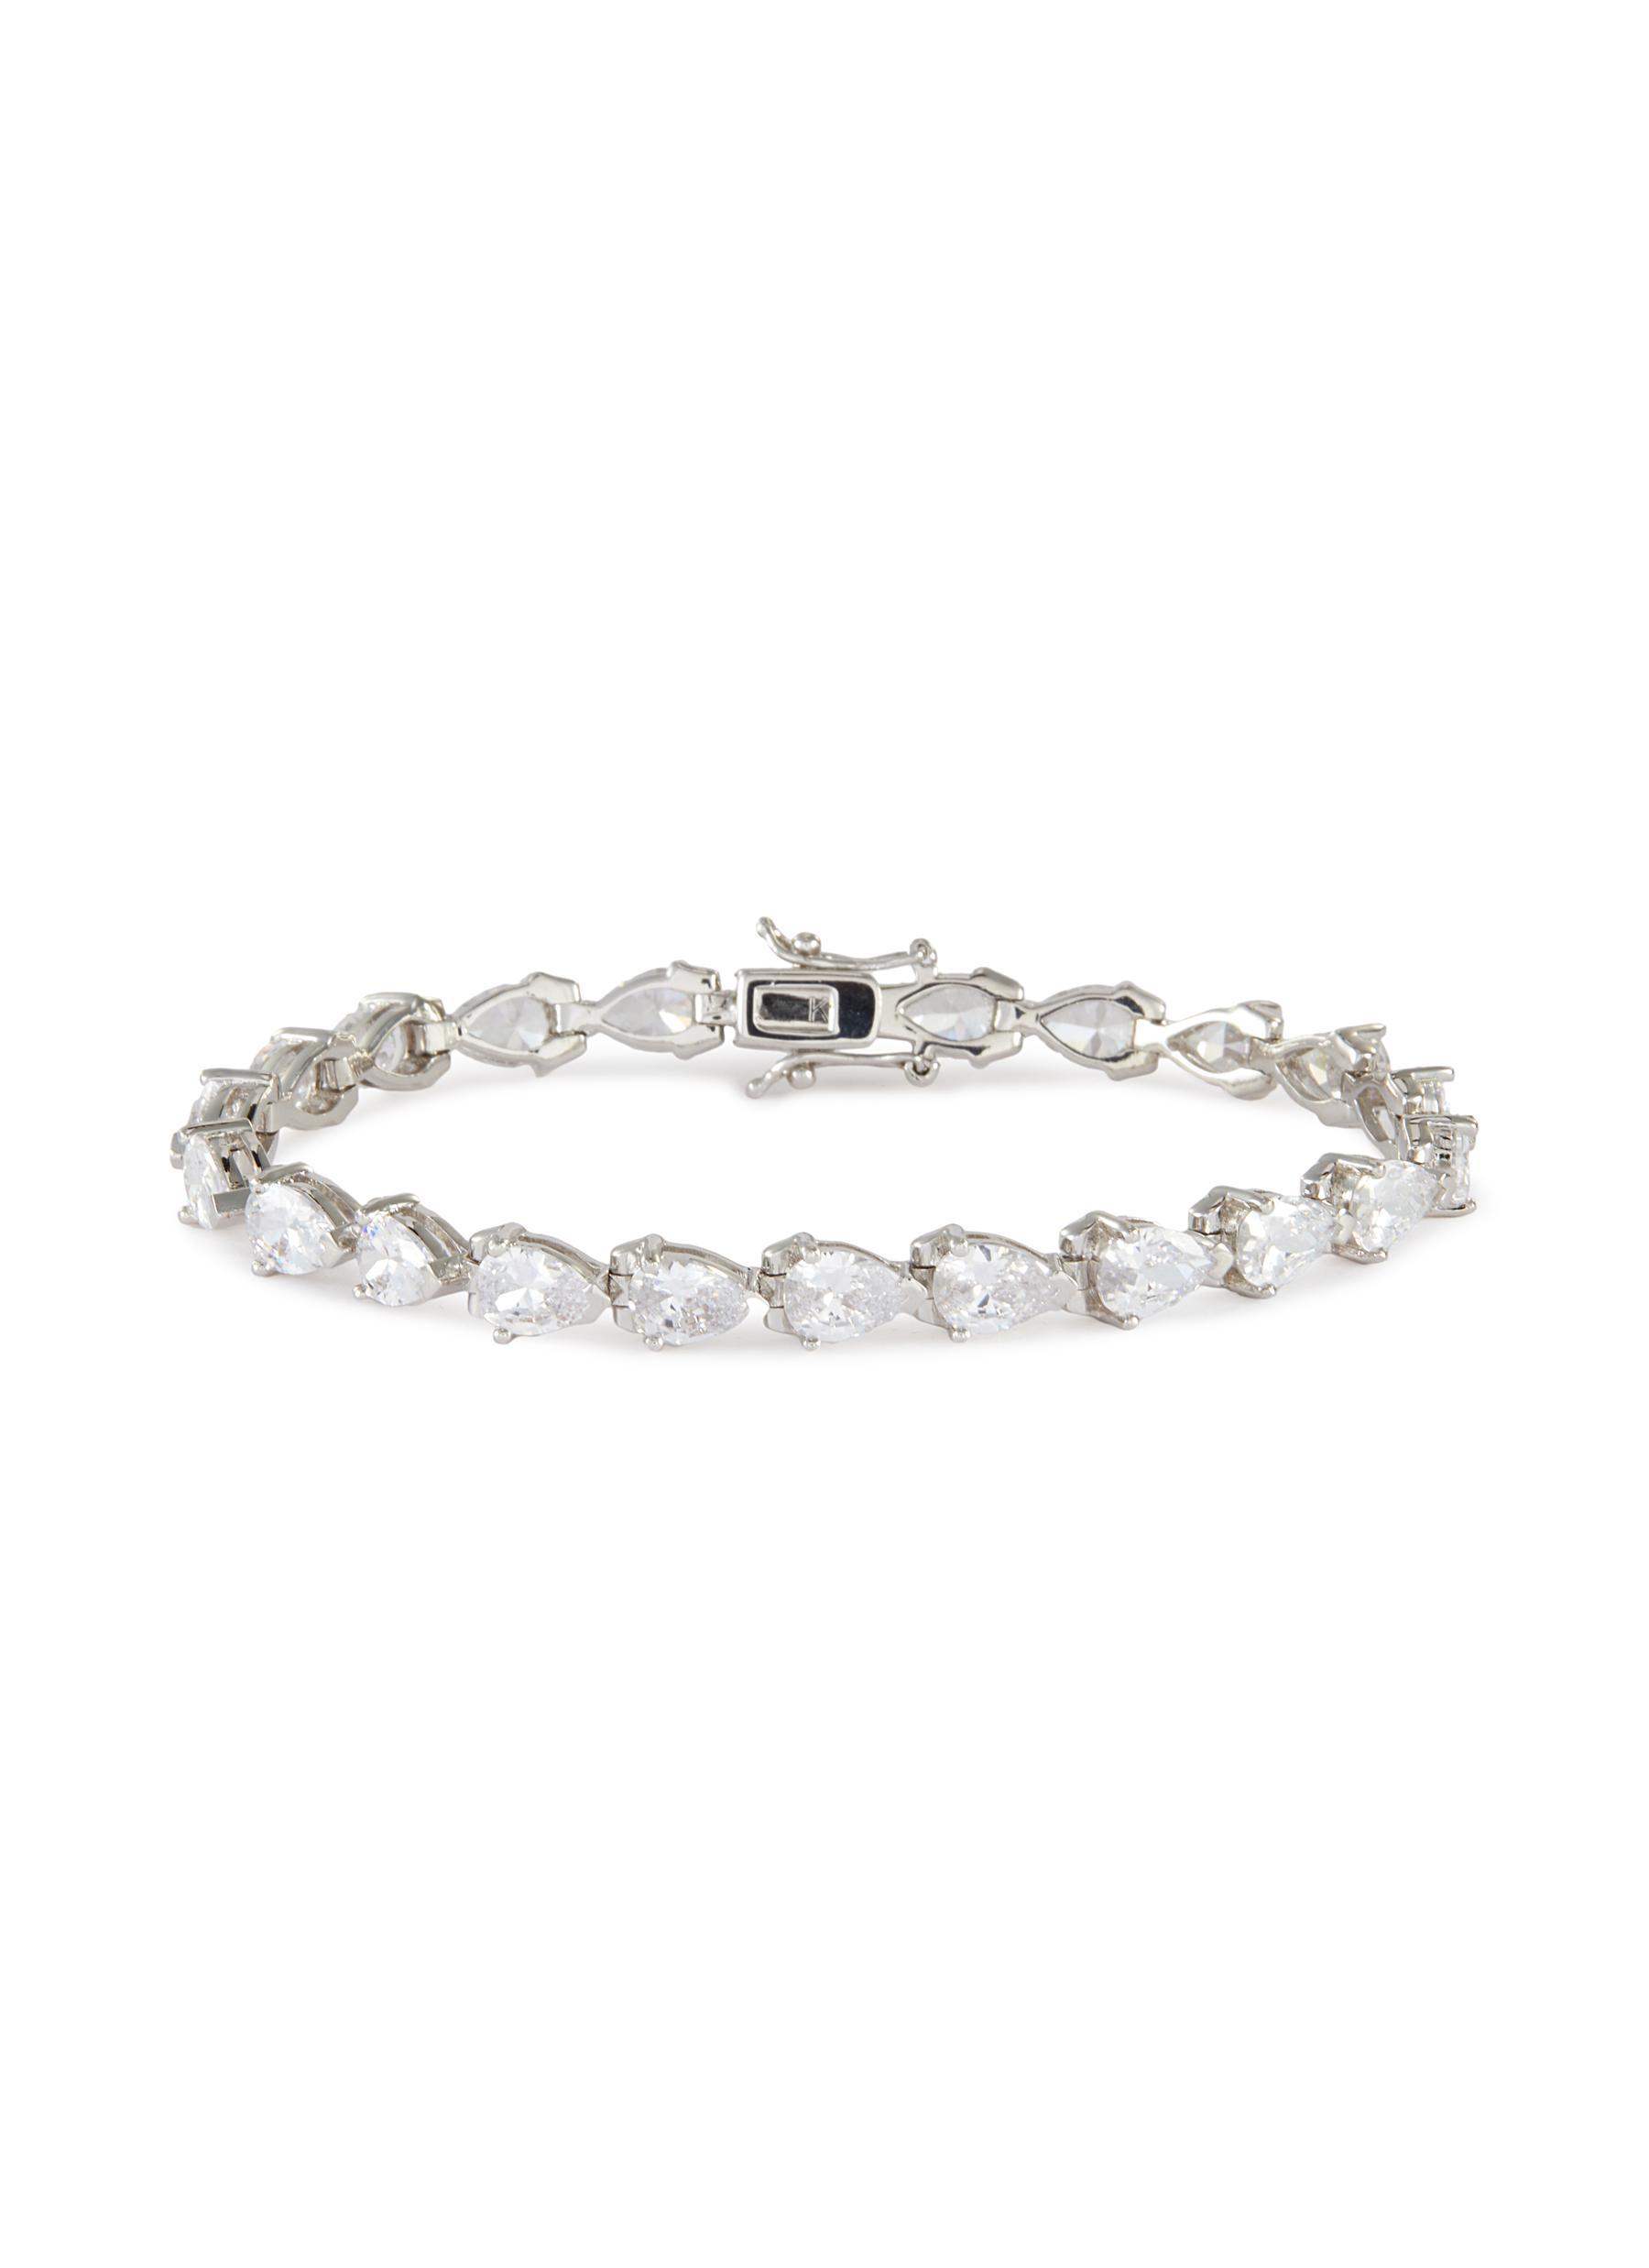 Pear cubic zirconia tennis bracelet